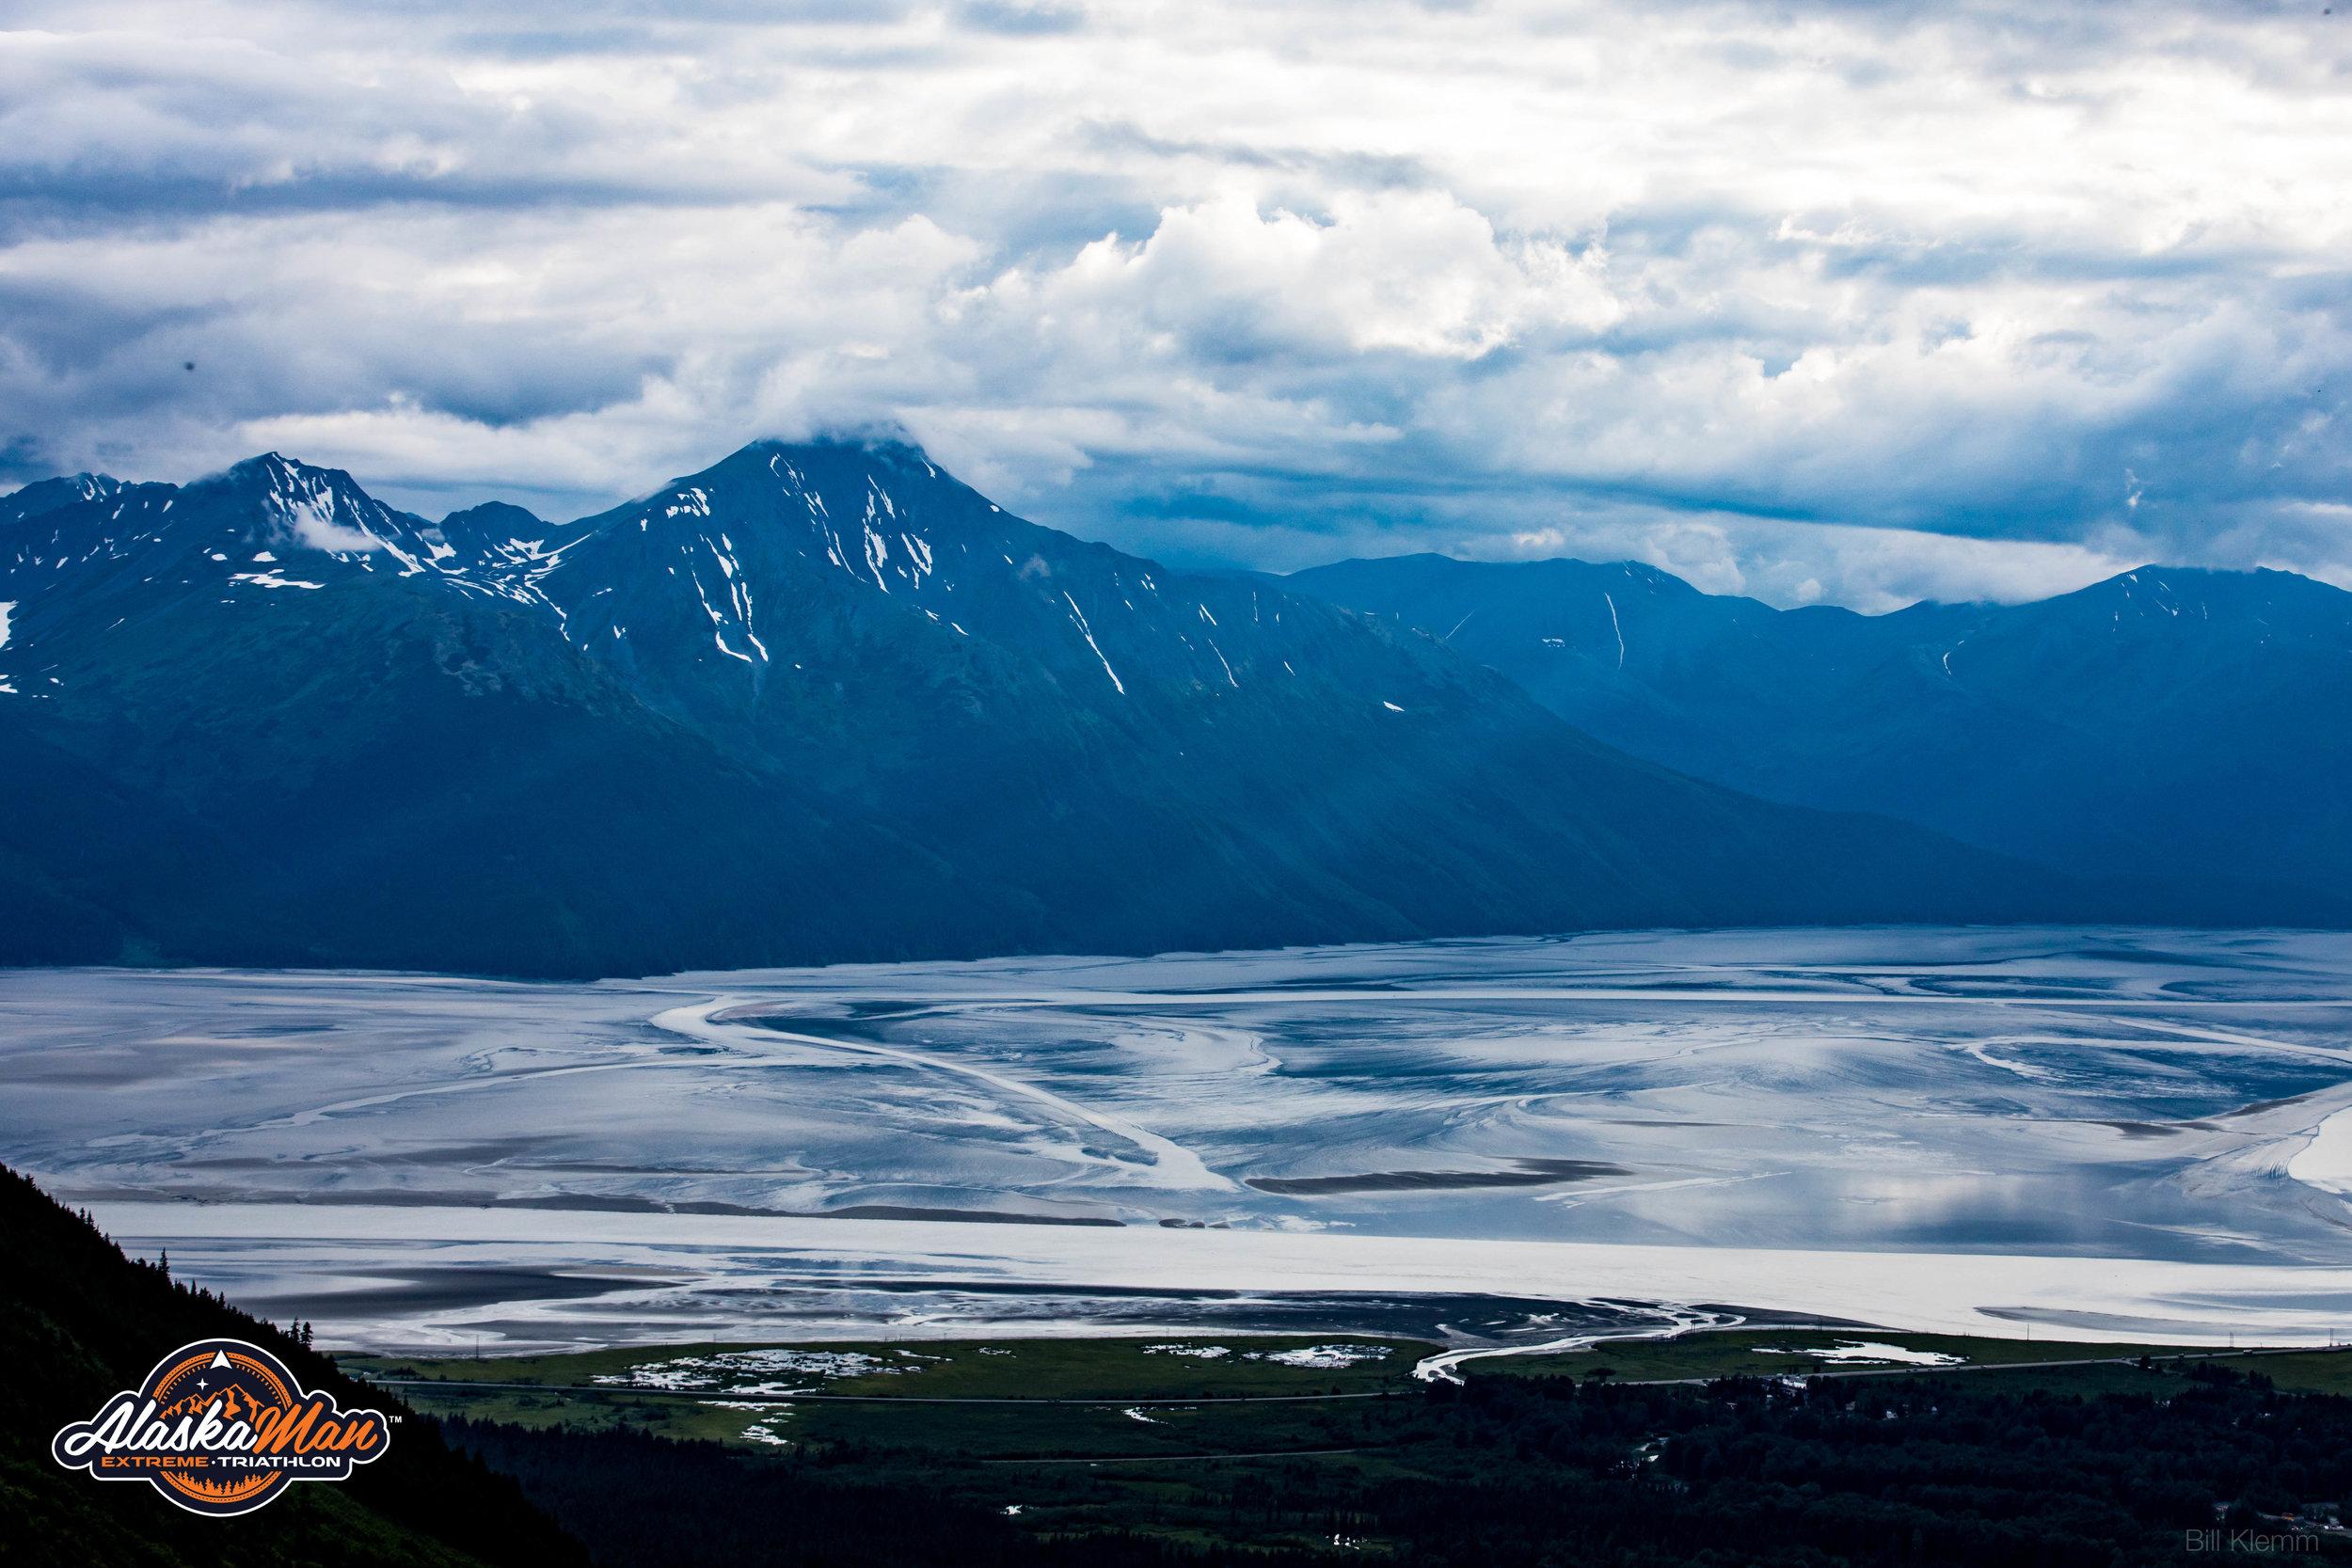 Alaskaman_2017_BK_A2_317.jpg